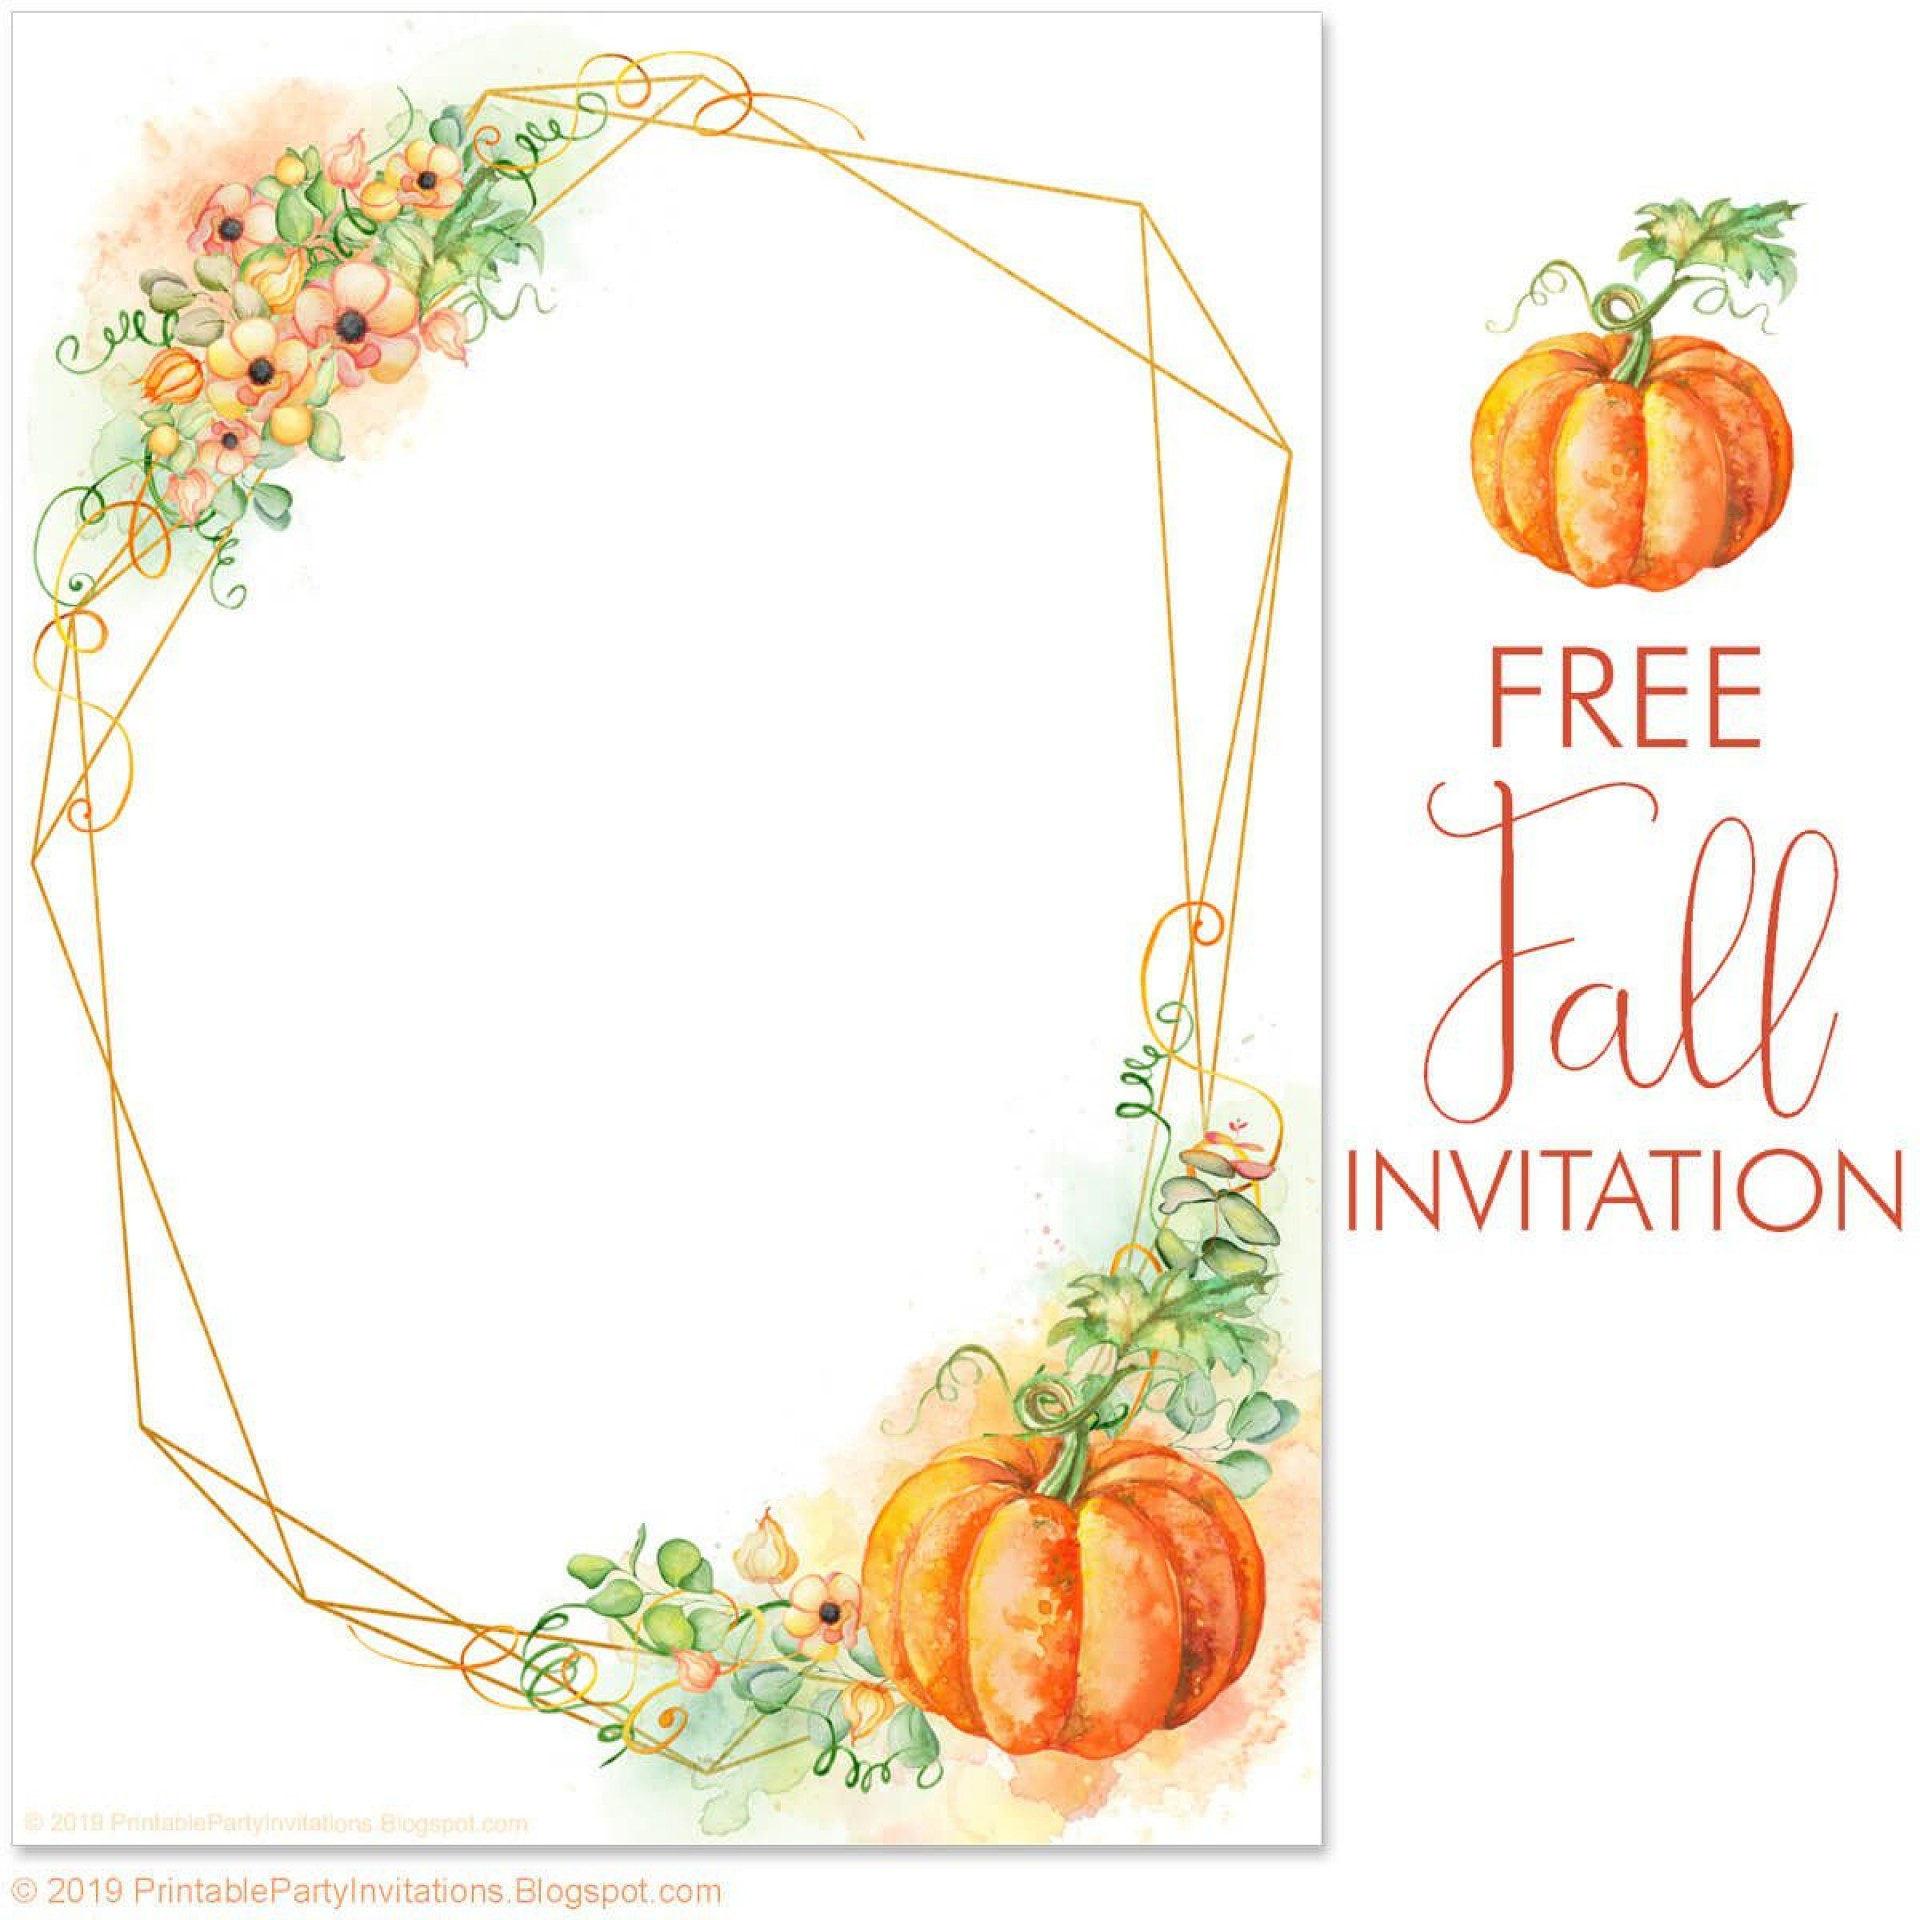 002 Fantastic Free Fall Invitation Template Printable Idea  Wedding For Mac Sunflower Burgundy1920